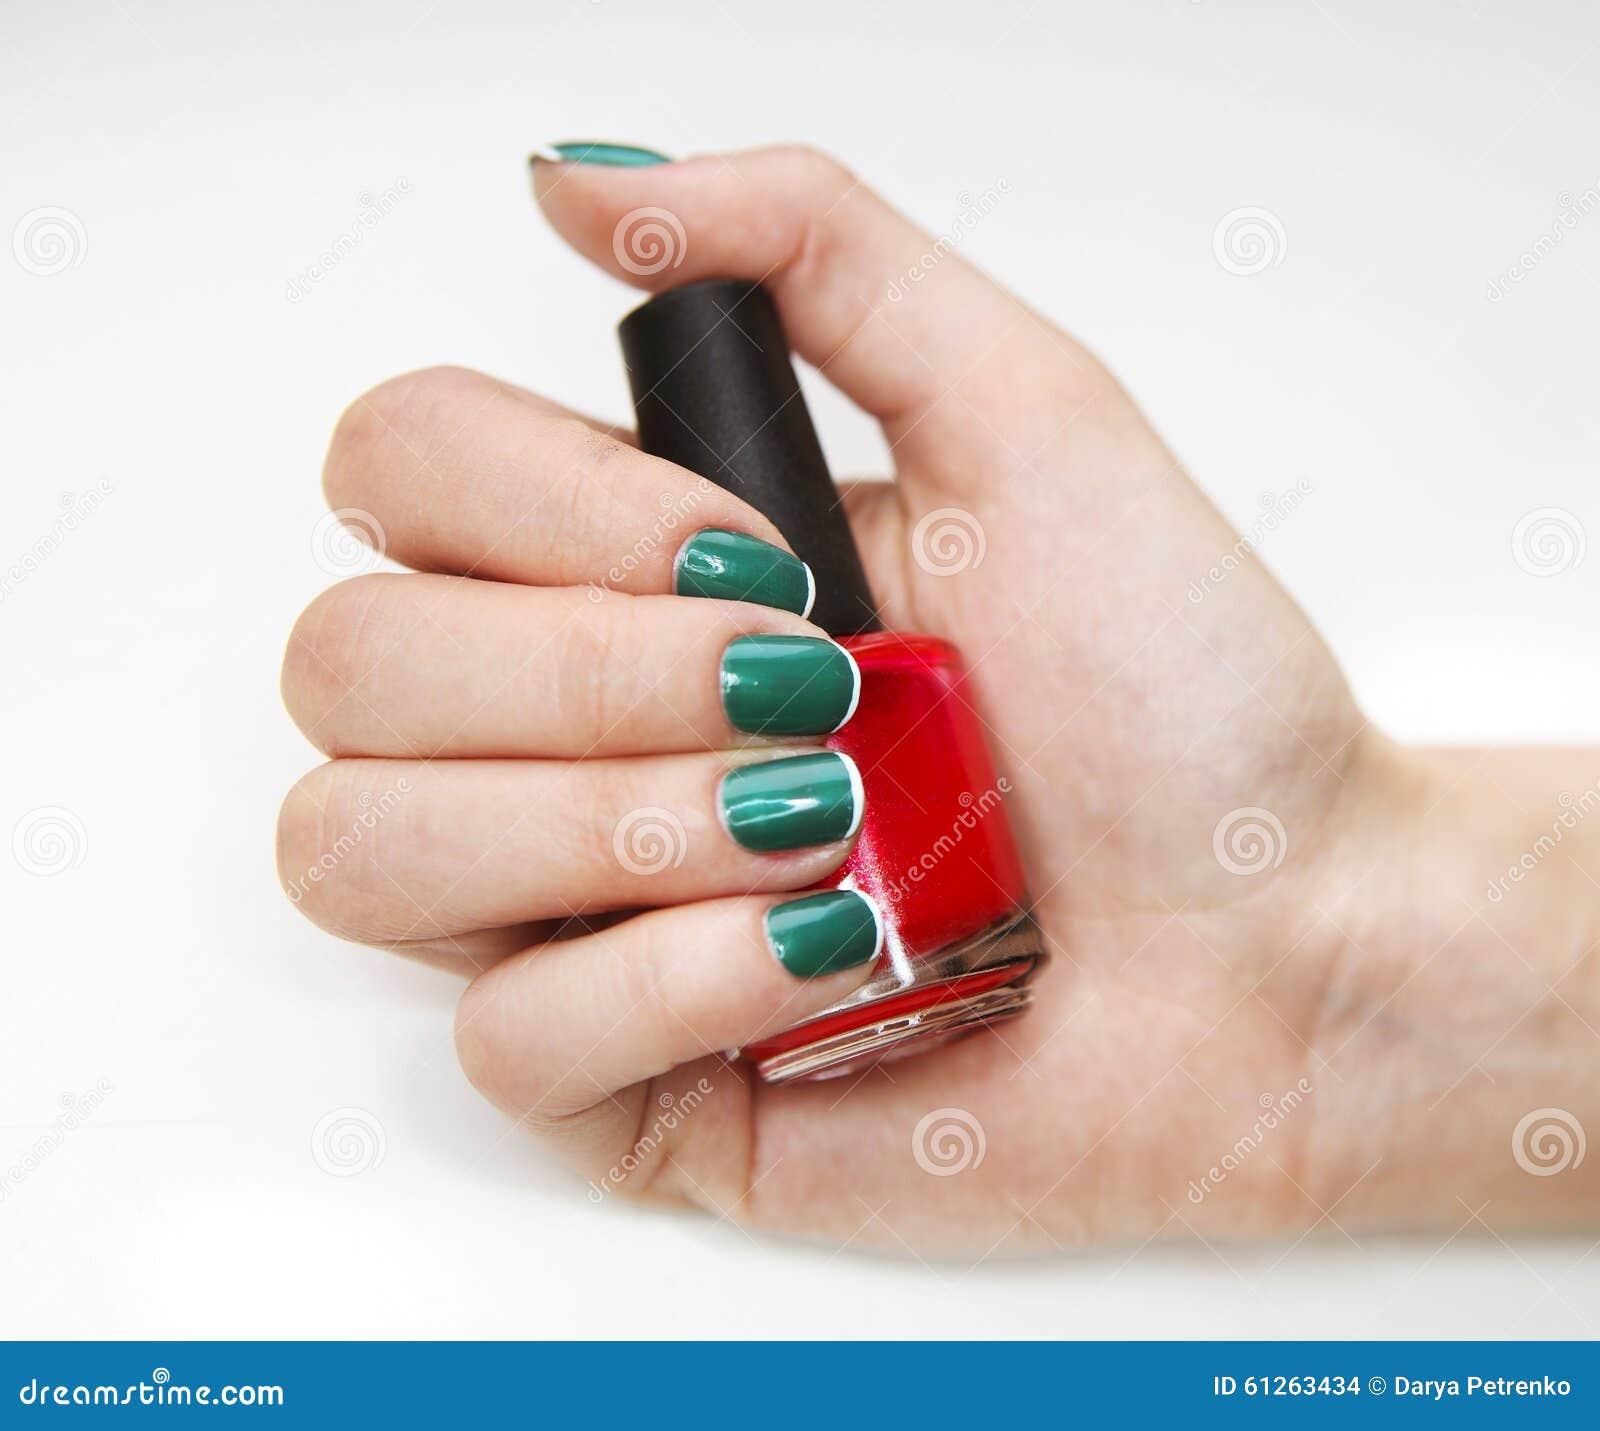 Feminine Nail Art With Nice Glitter Green And White Nail Polish